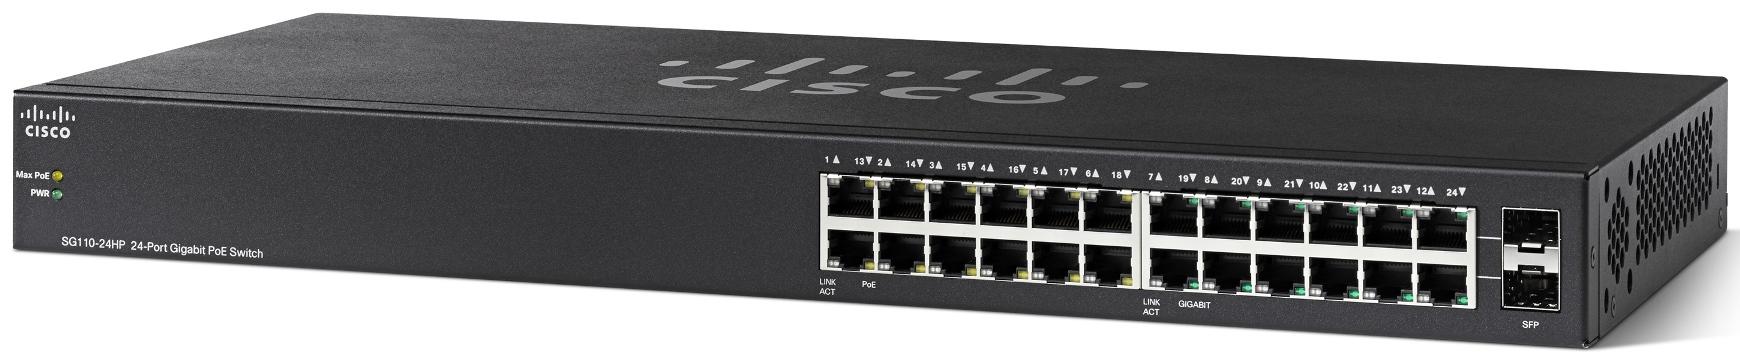 Cisco SG110-24HP 24-Port PoE Gigabit Switch